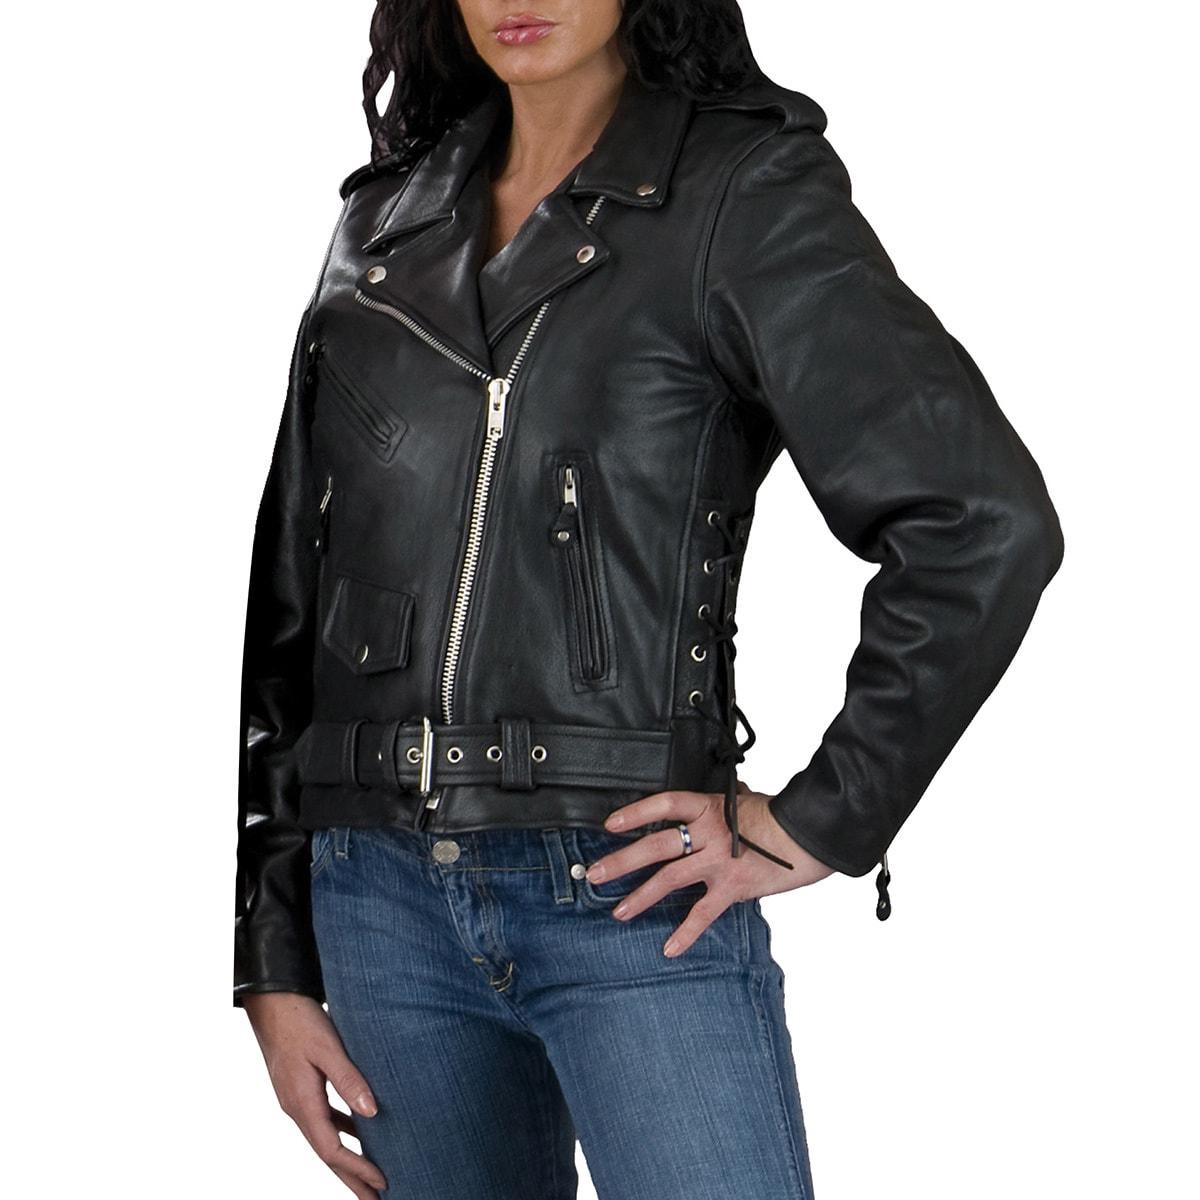 Apparel & Merchandise Men's Clothing Men Genuine Black Leather Motorcycle Jacket Size 6 Xl Jade White